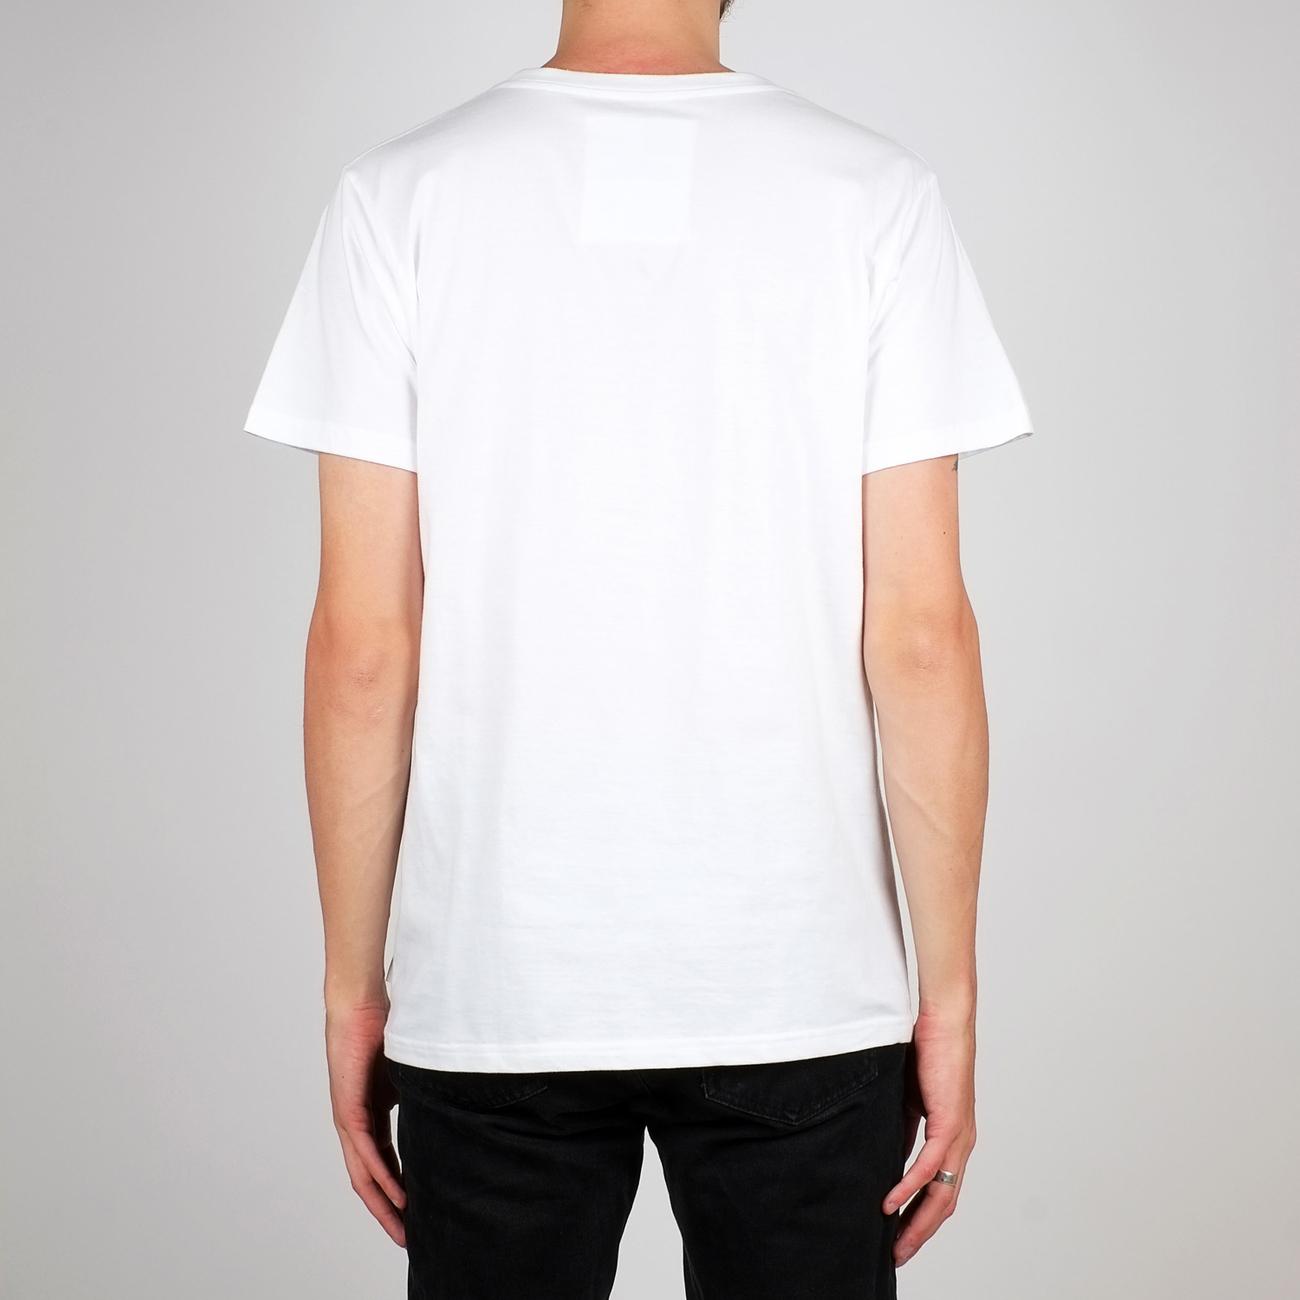 T-shirt Stockholm Ol Dirty Bastard